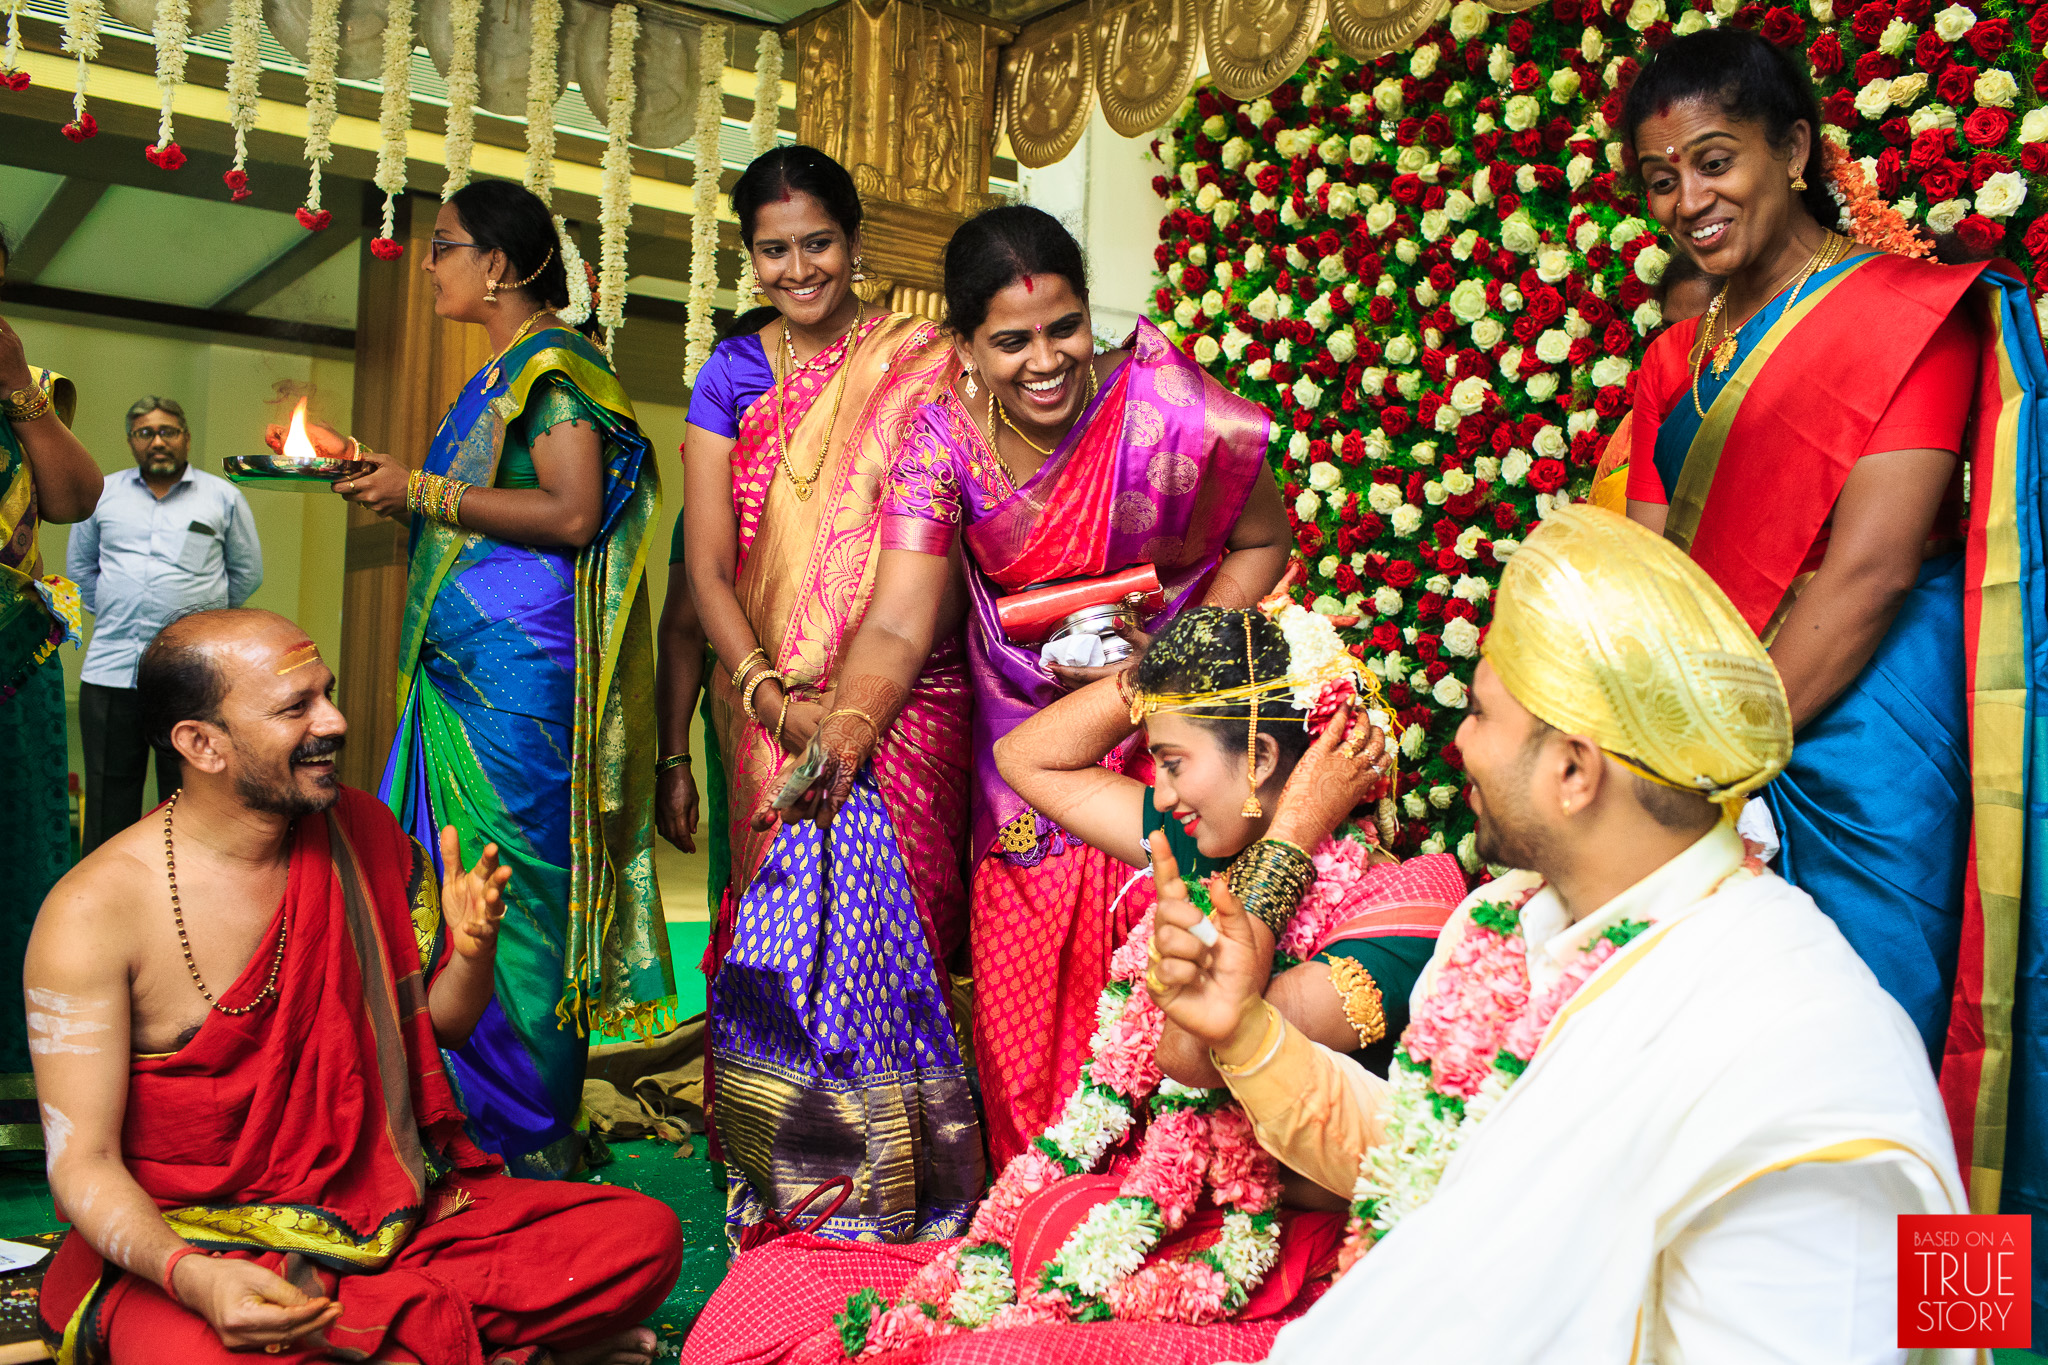 Tamil-Candid-Wedding-Photography-0097.jpg